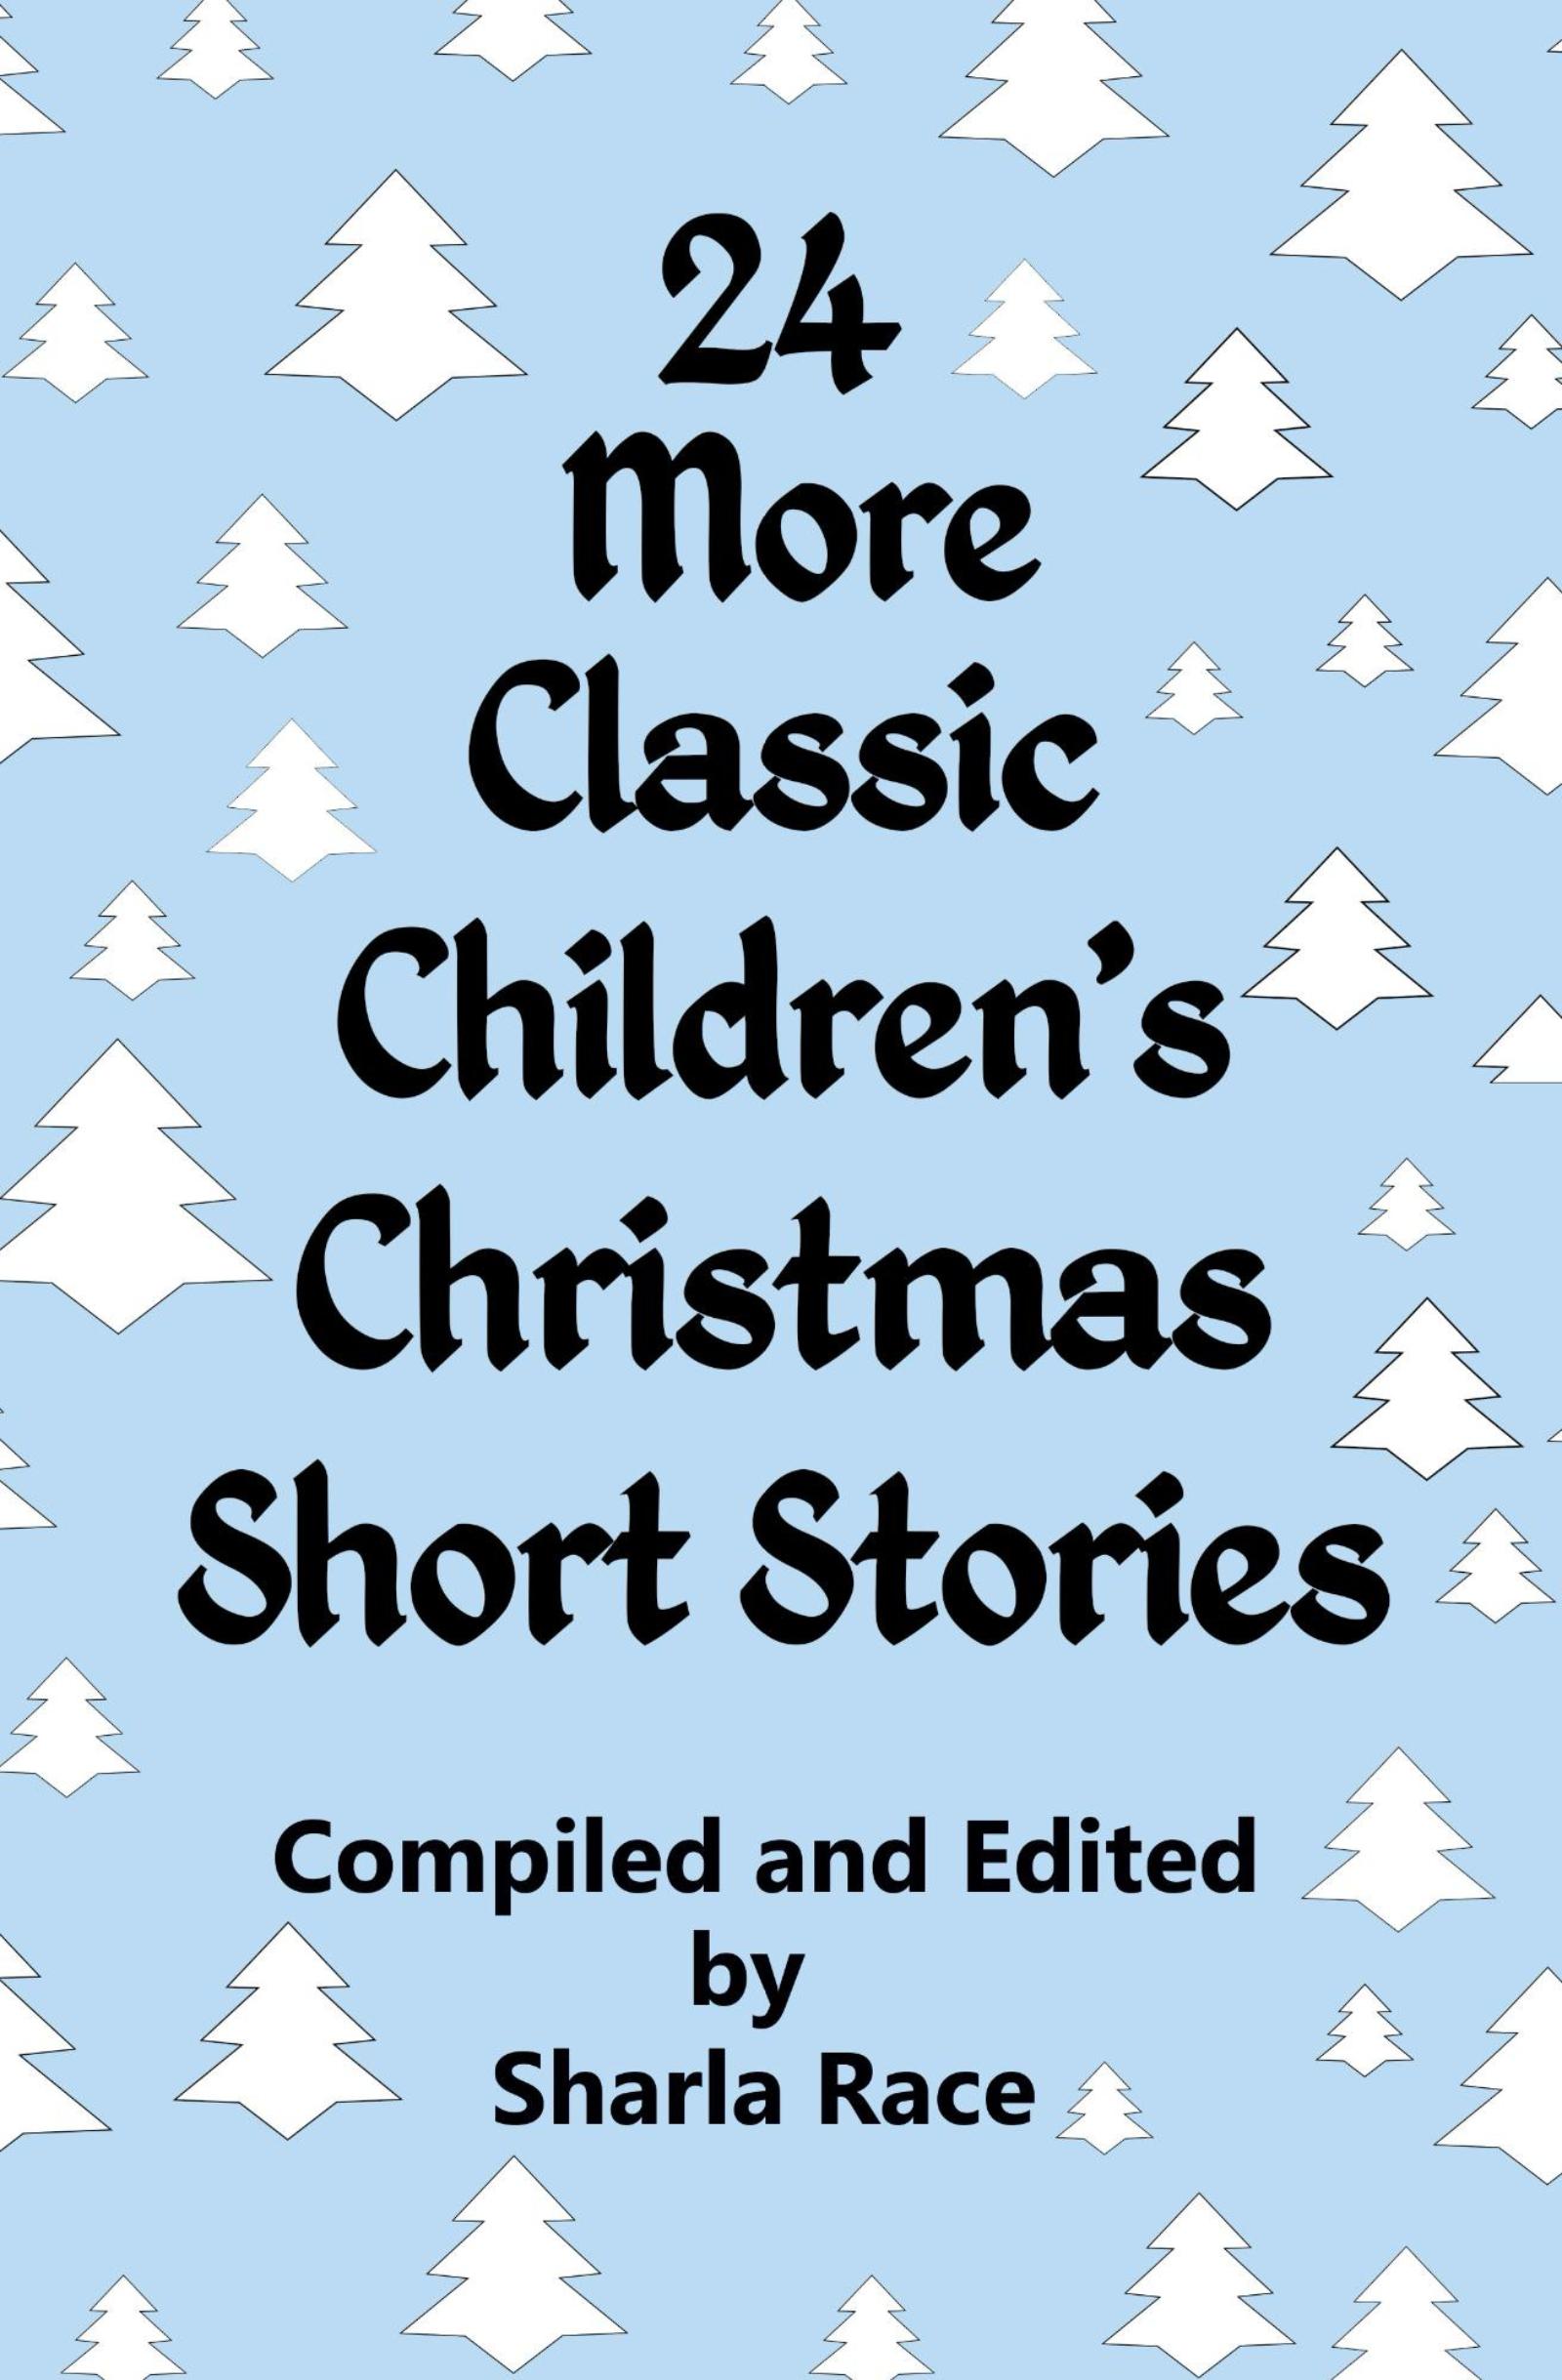 Short Christmas Stories.24 More Classic Children S Christmas Short Stories An Ebook By Sharla Race